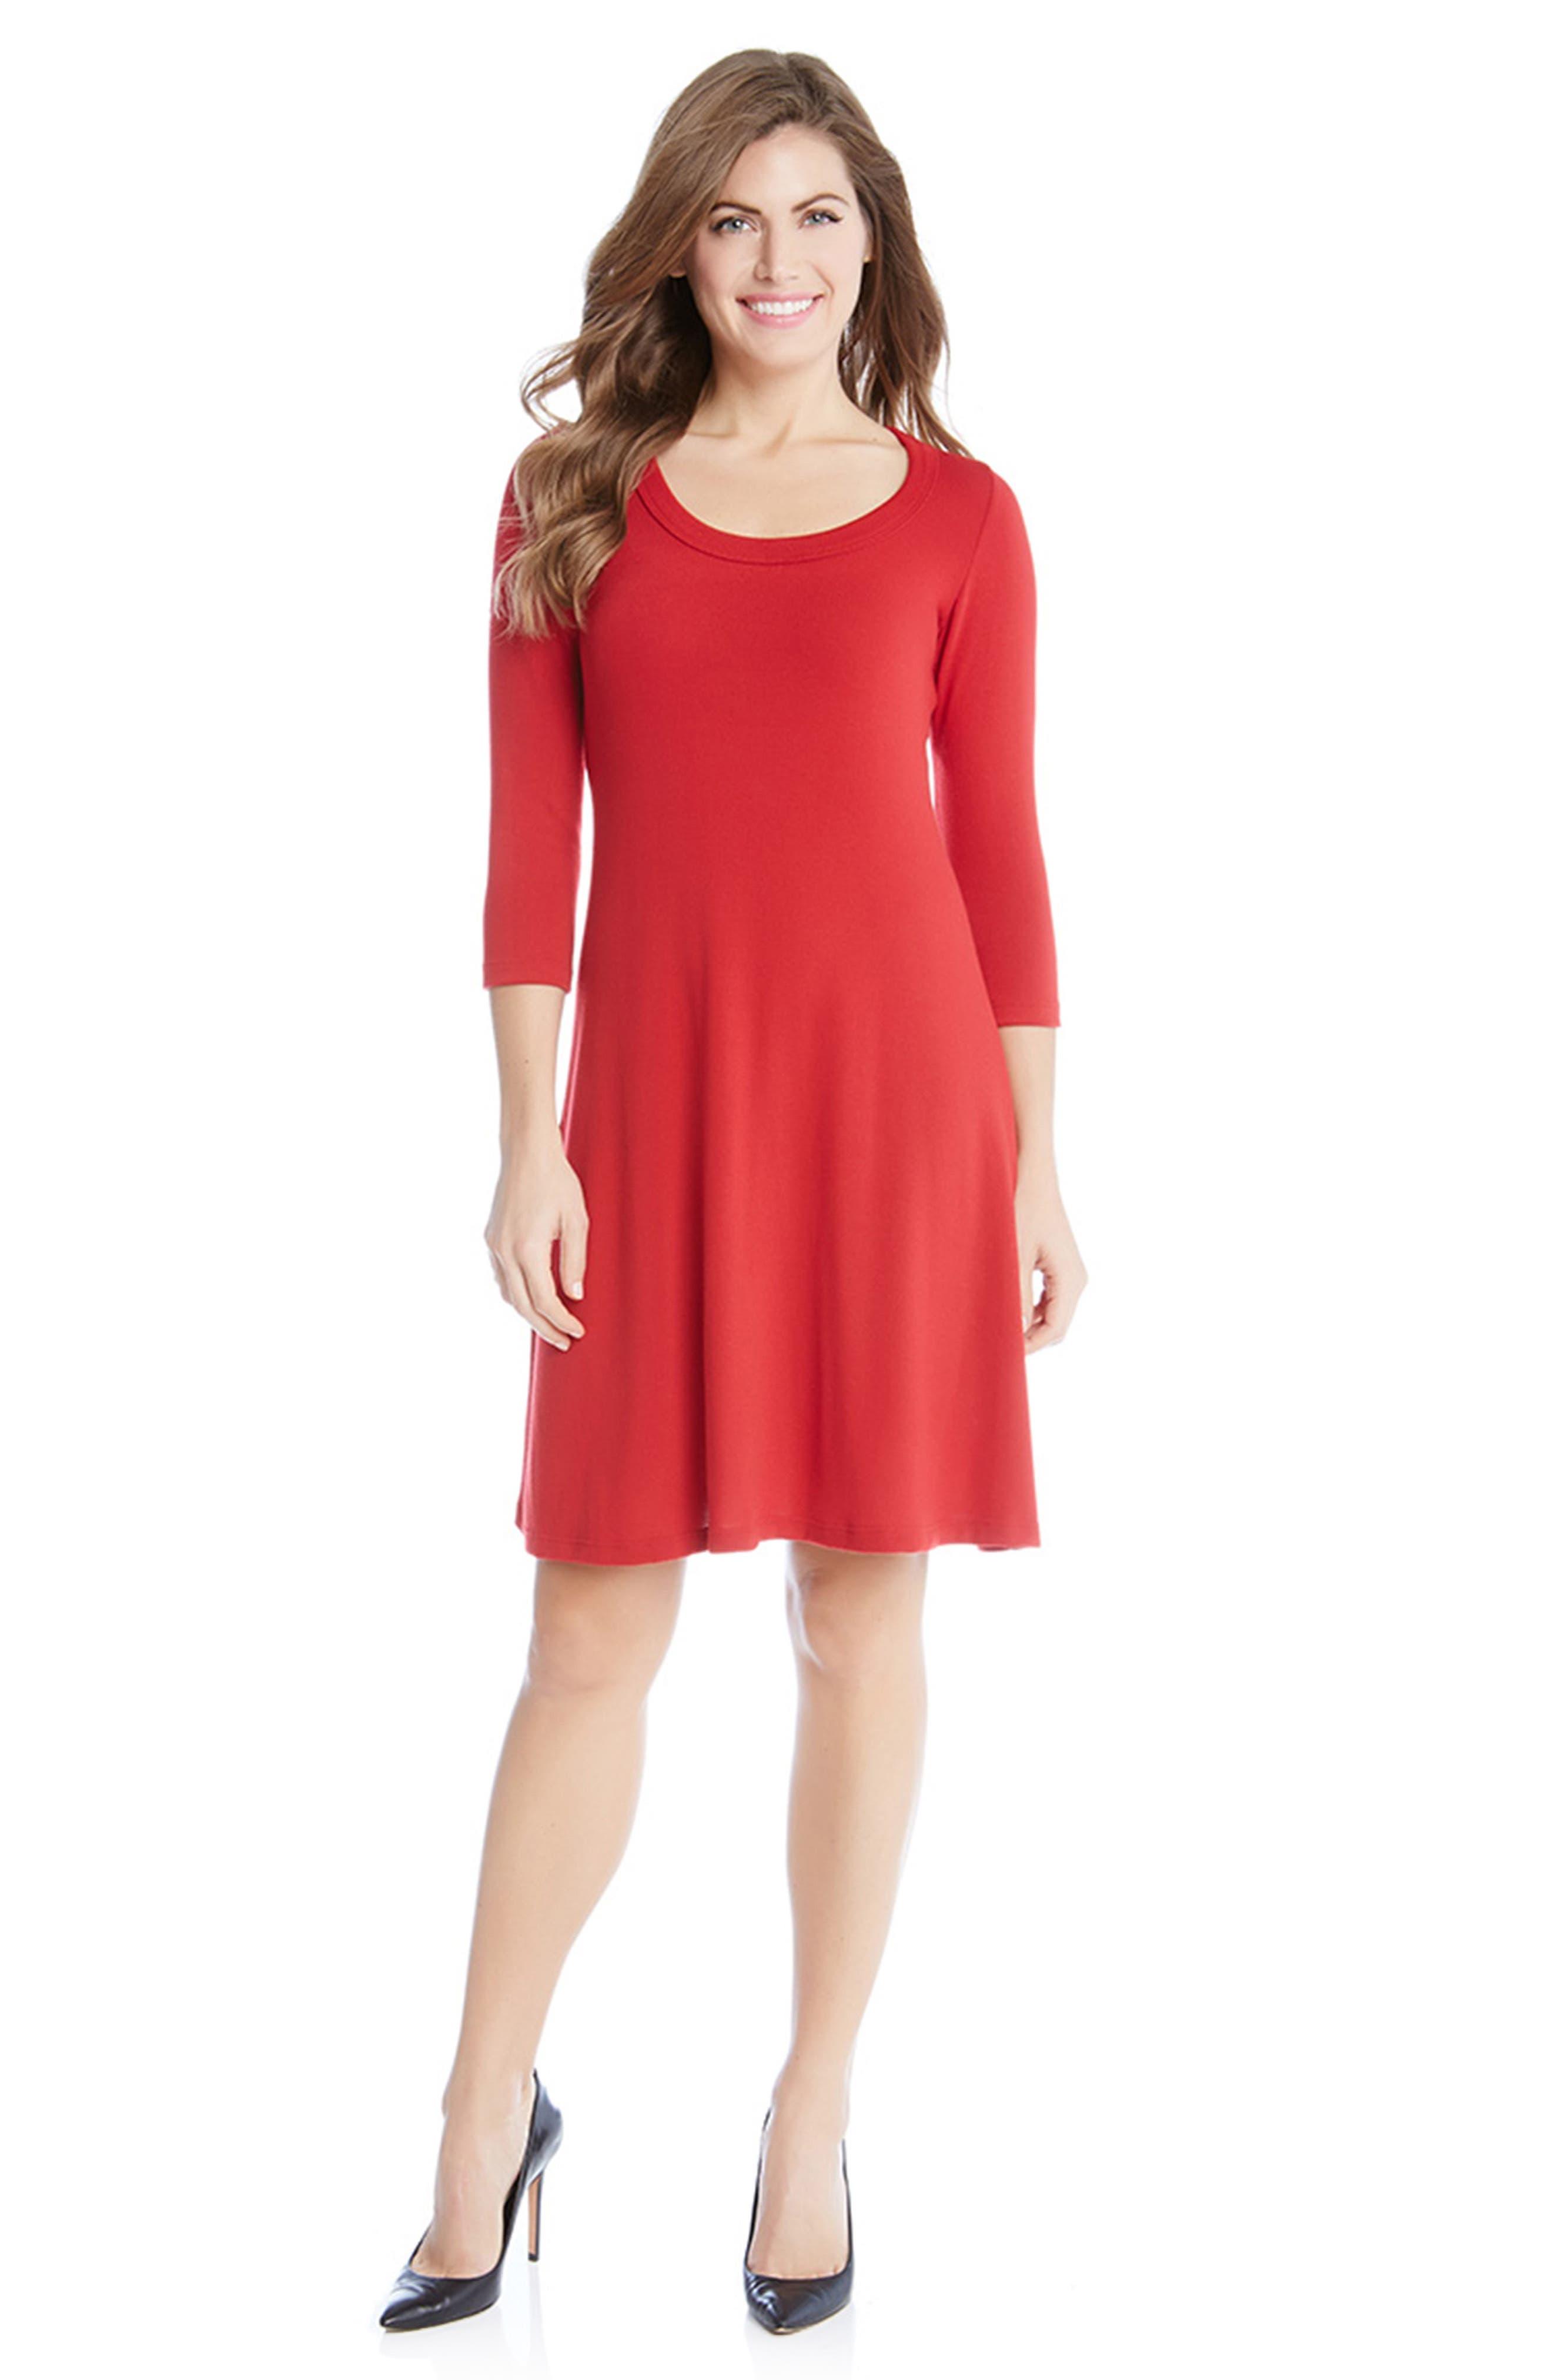 A-Line Sweater Dress,                             Alternate thumbnail 3, color,                             600